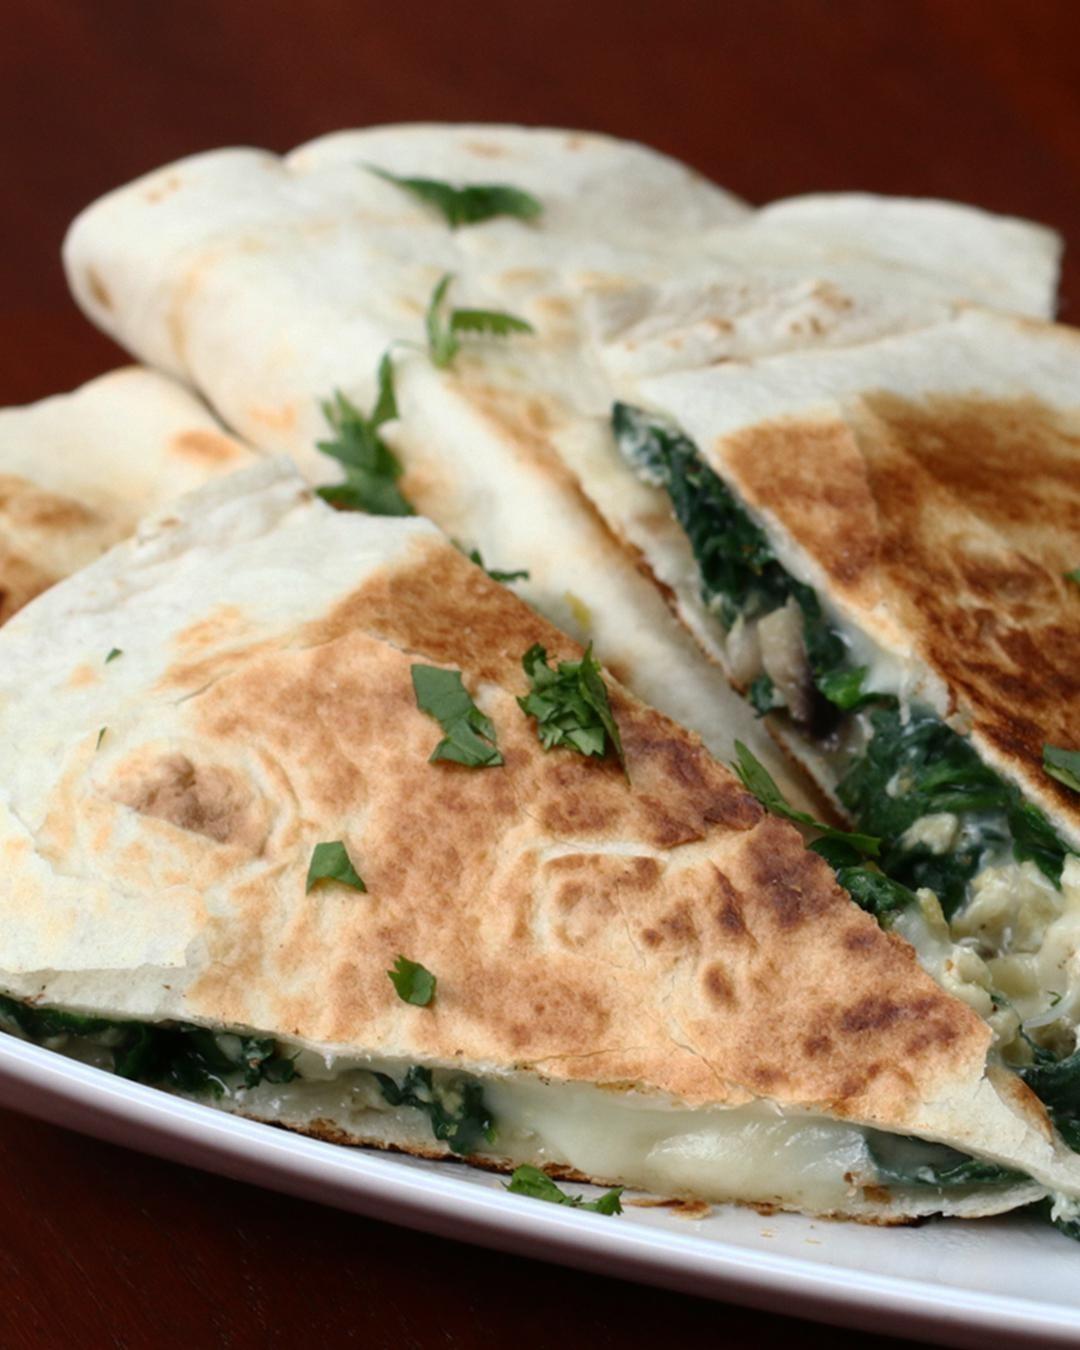 Spinach and Mushroom Quesadilla